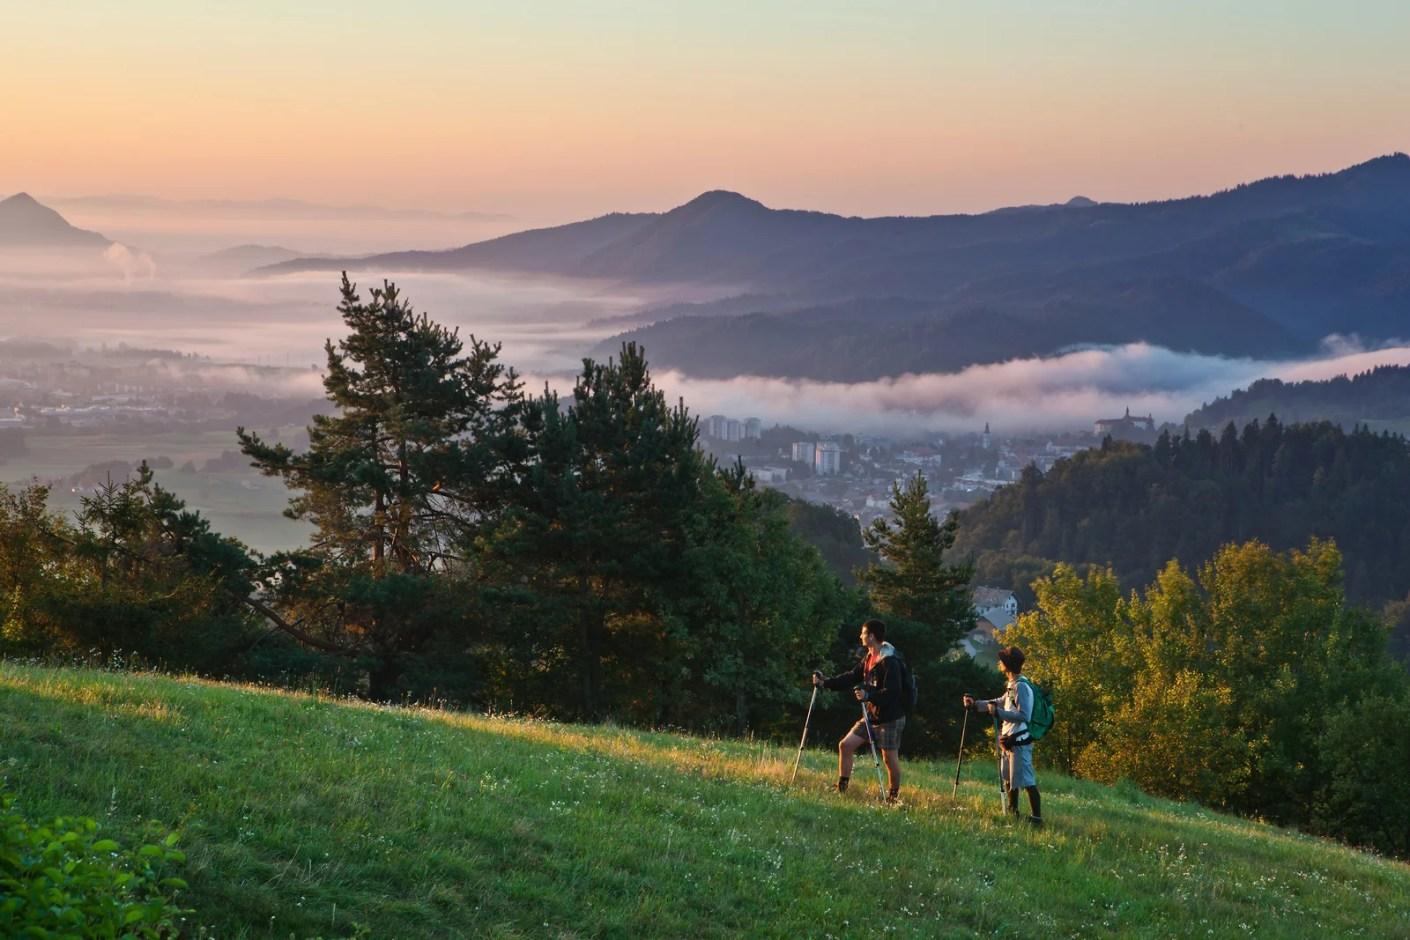 Image courtesy of the Slovenia Tourist Board.